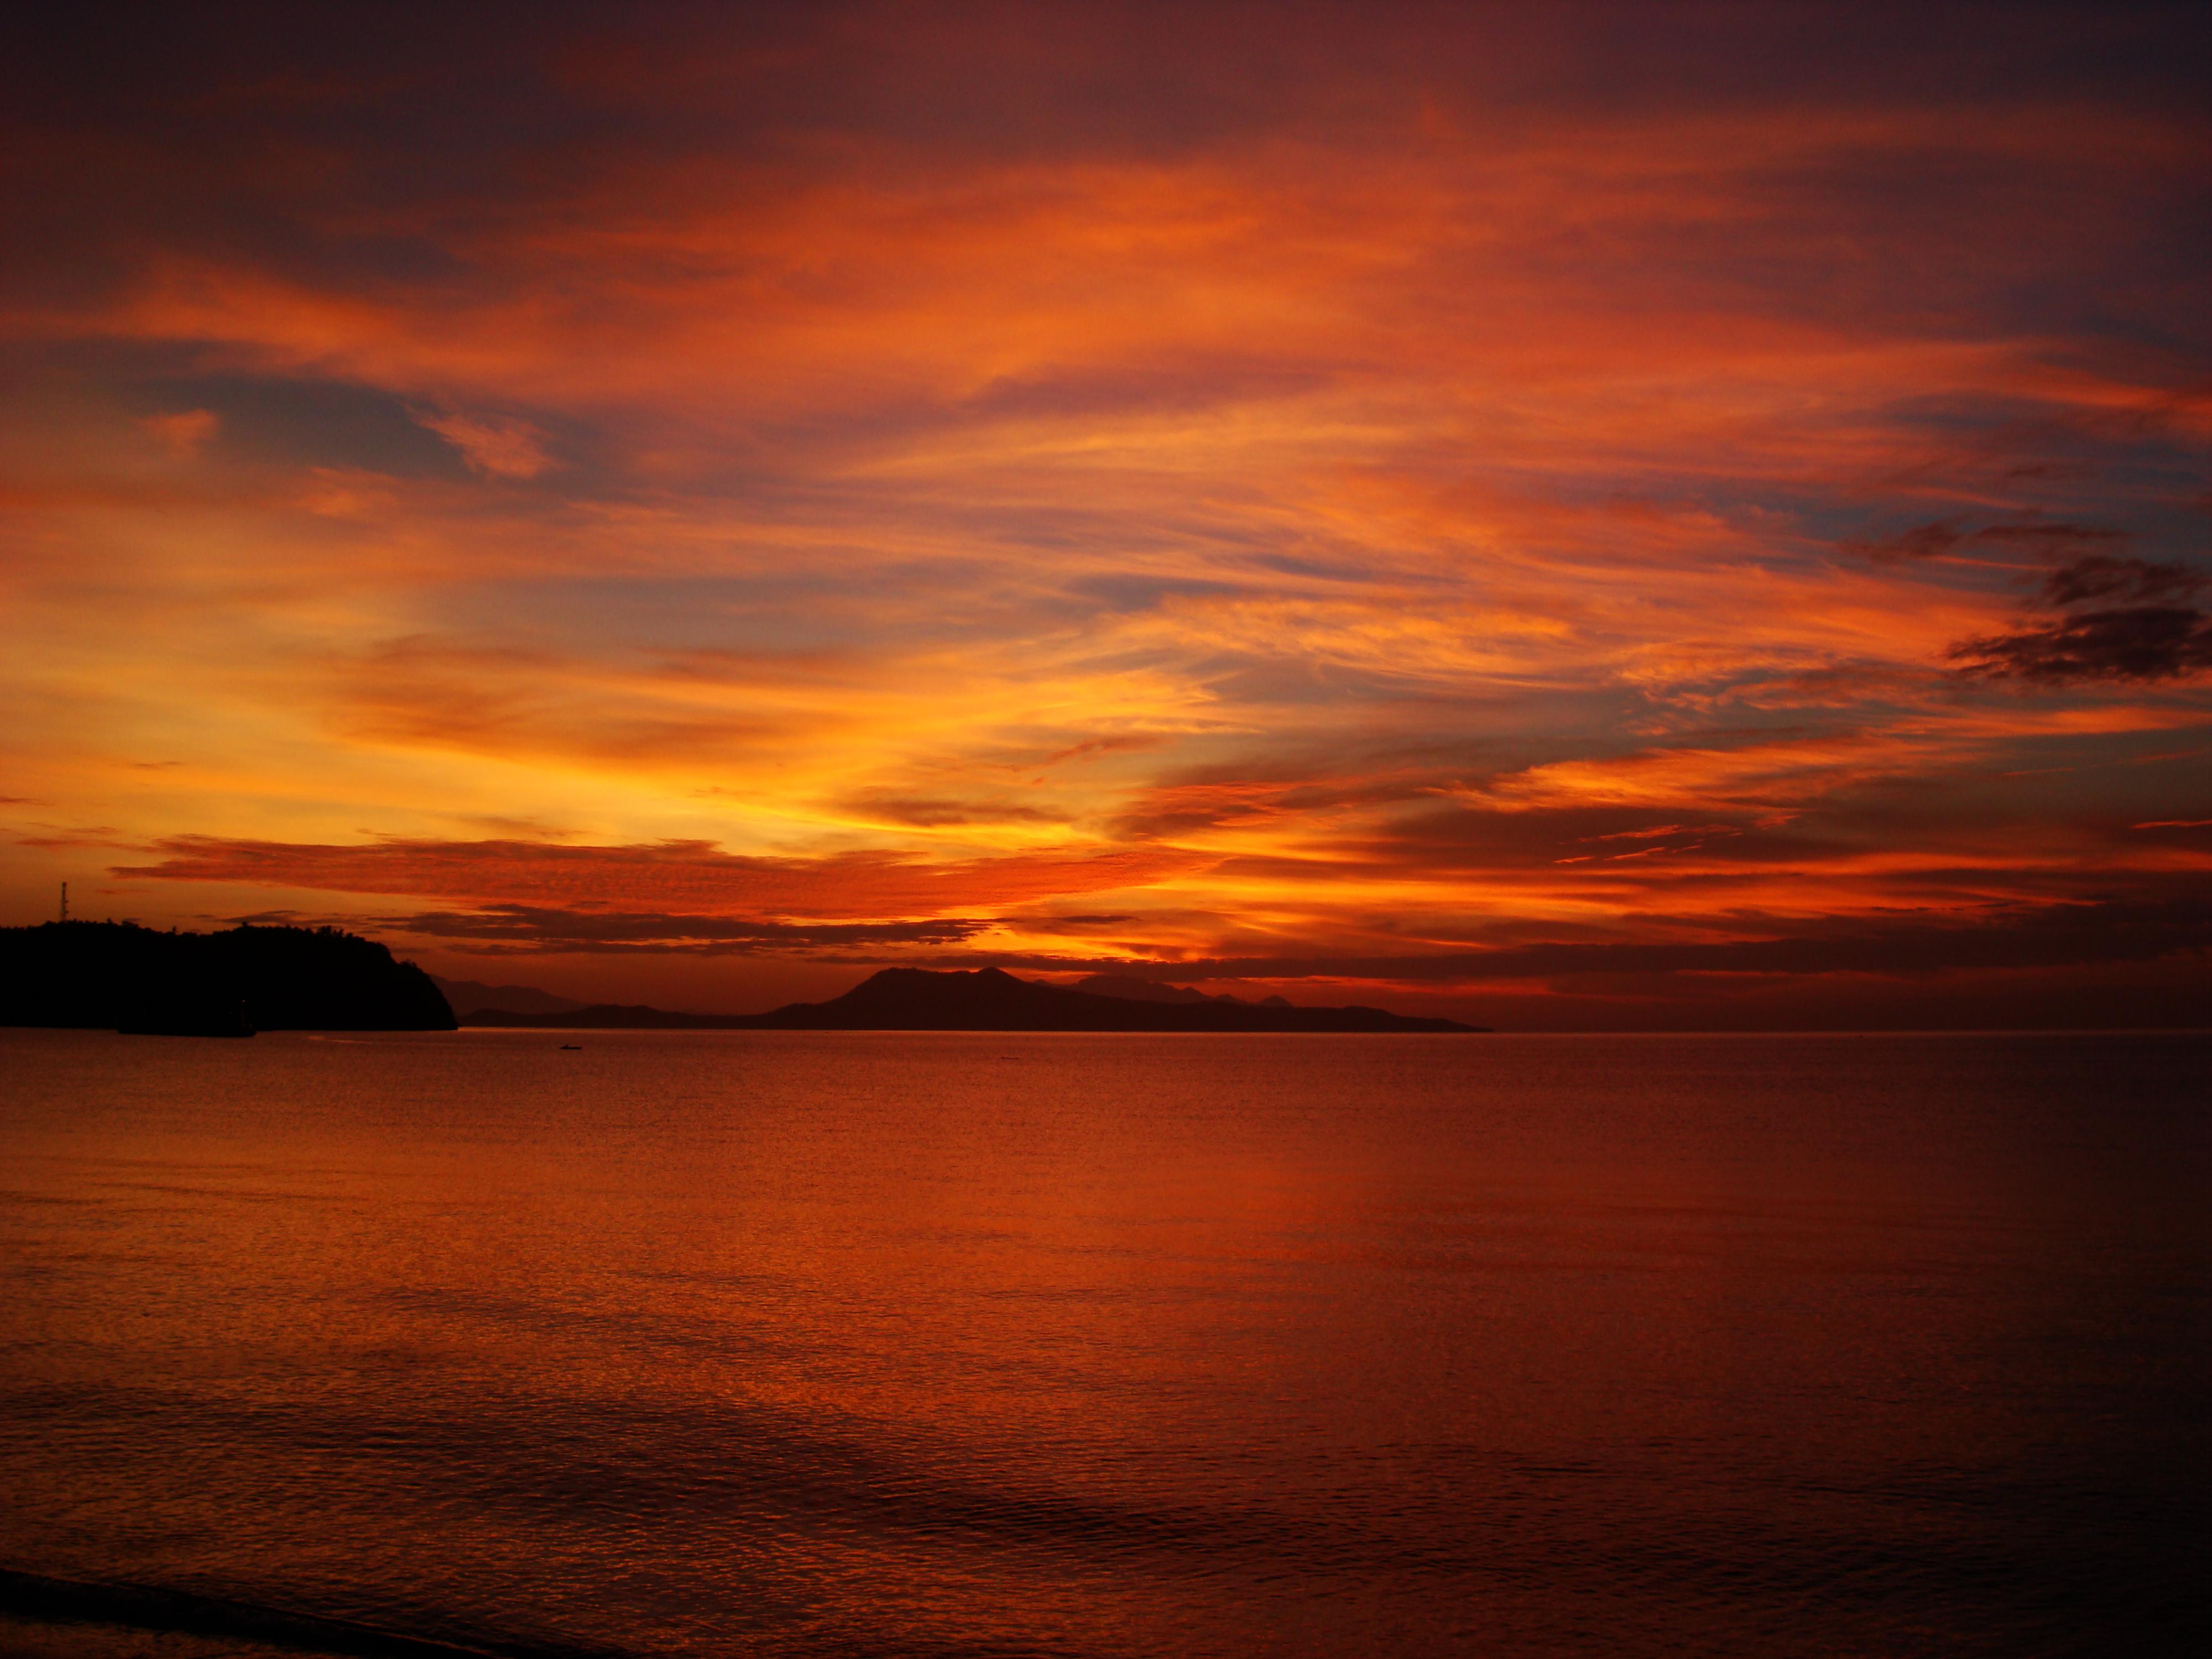 Sunrise Philippines Mindoro Island Tabinay 52